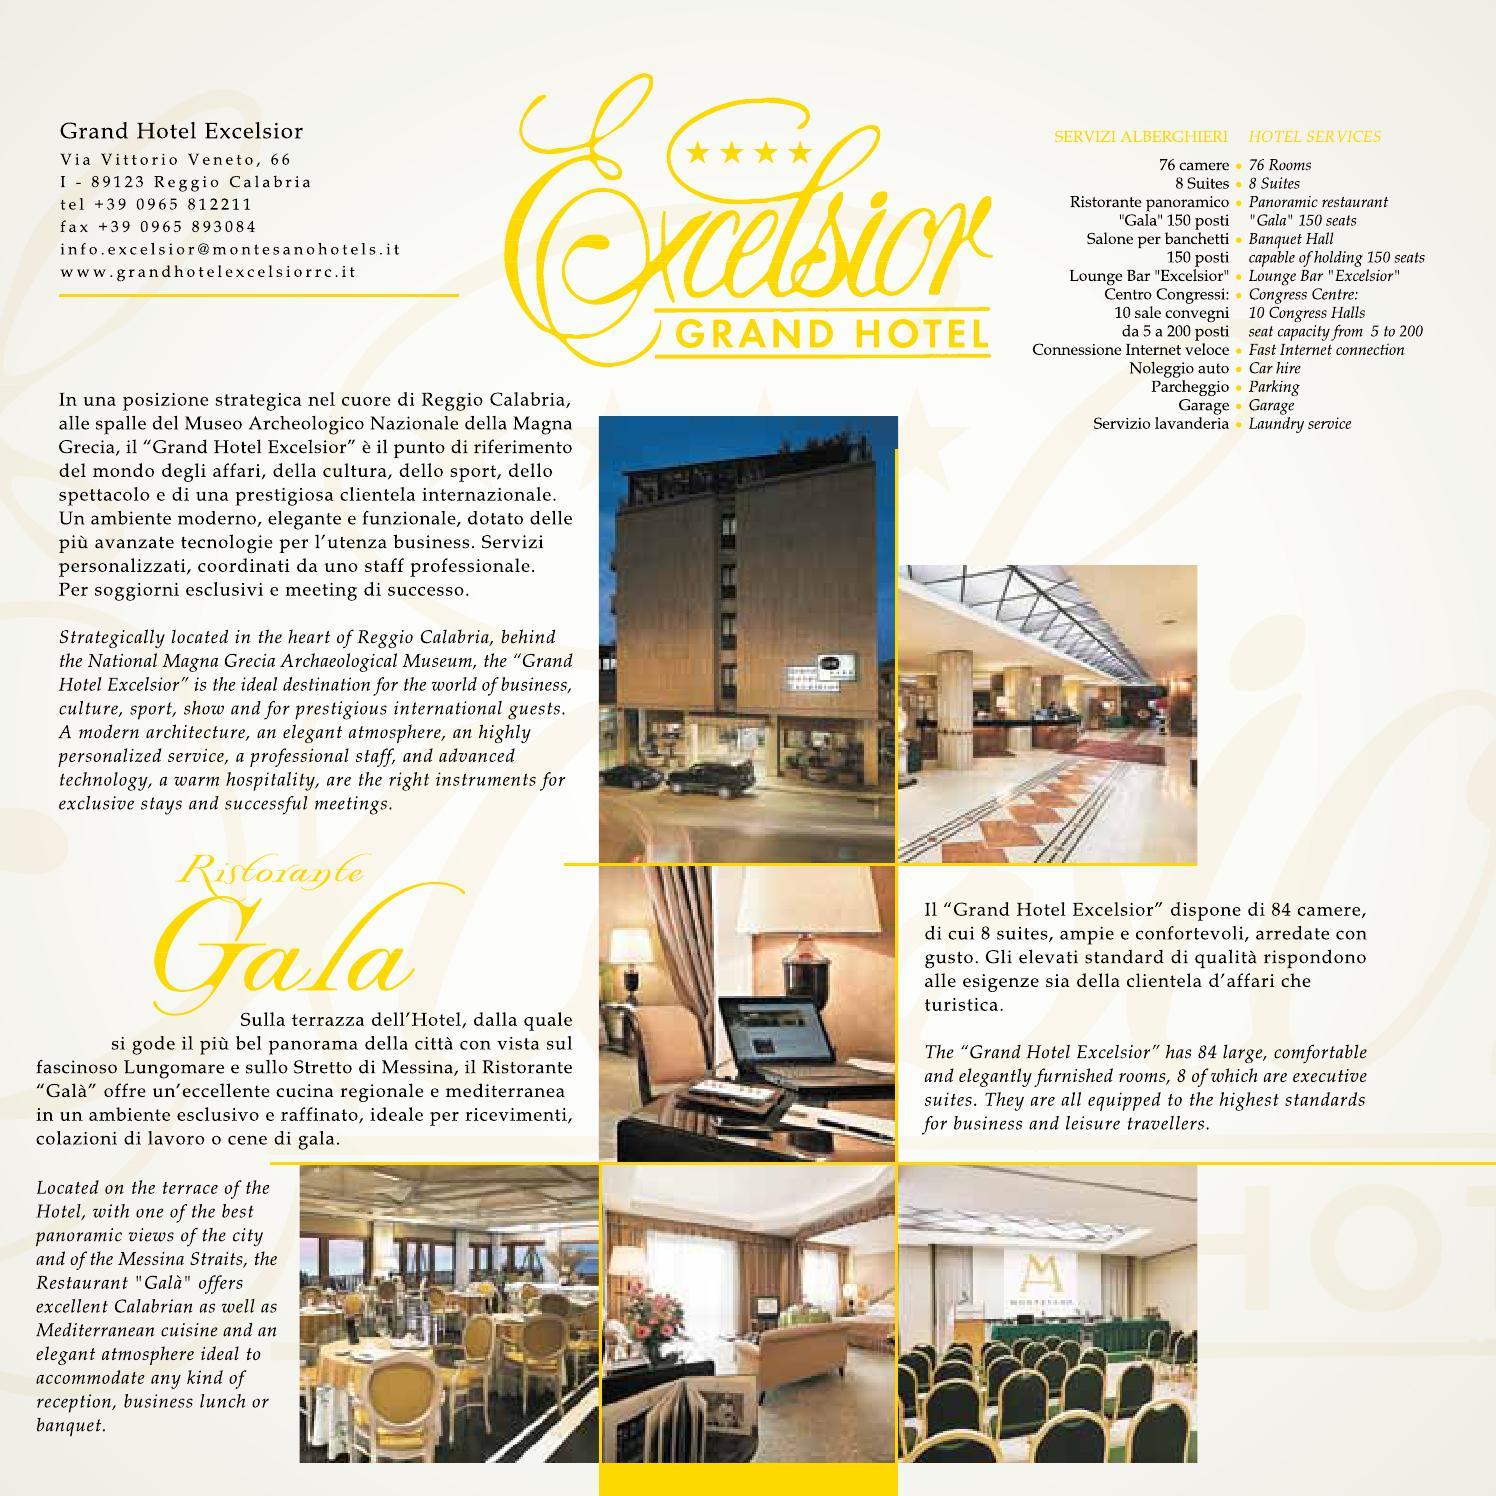 Grand Hotel Excelsior Reggio Calabria By Blastness Srl Issuu